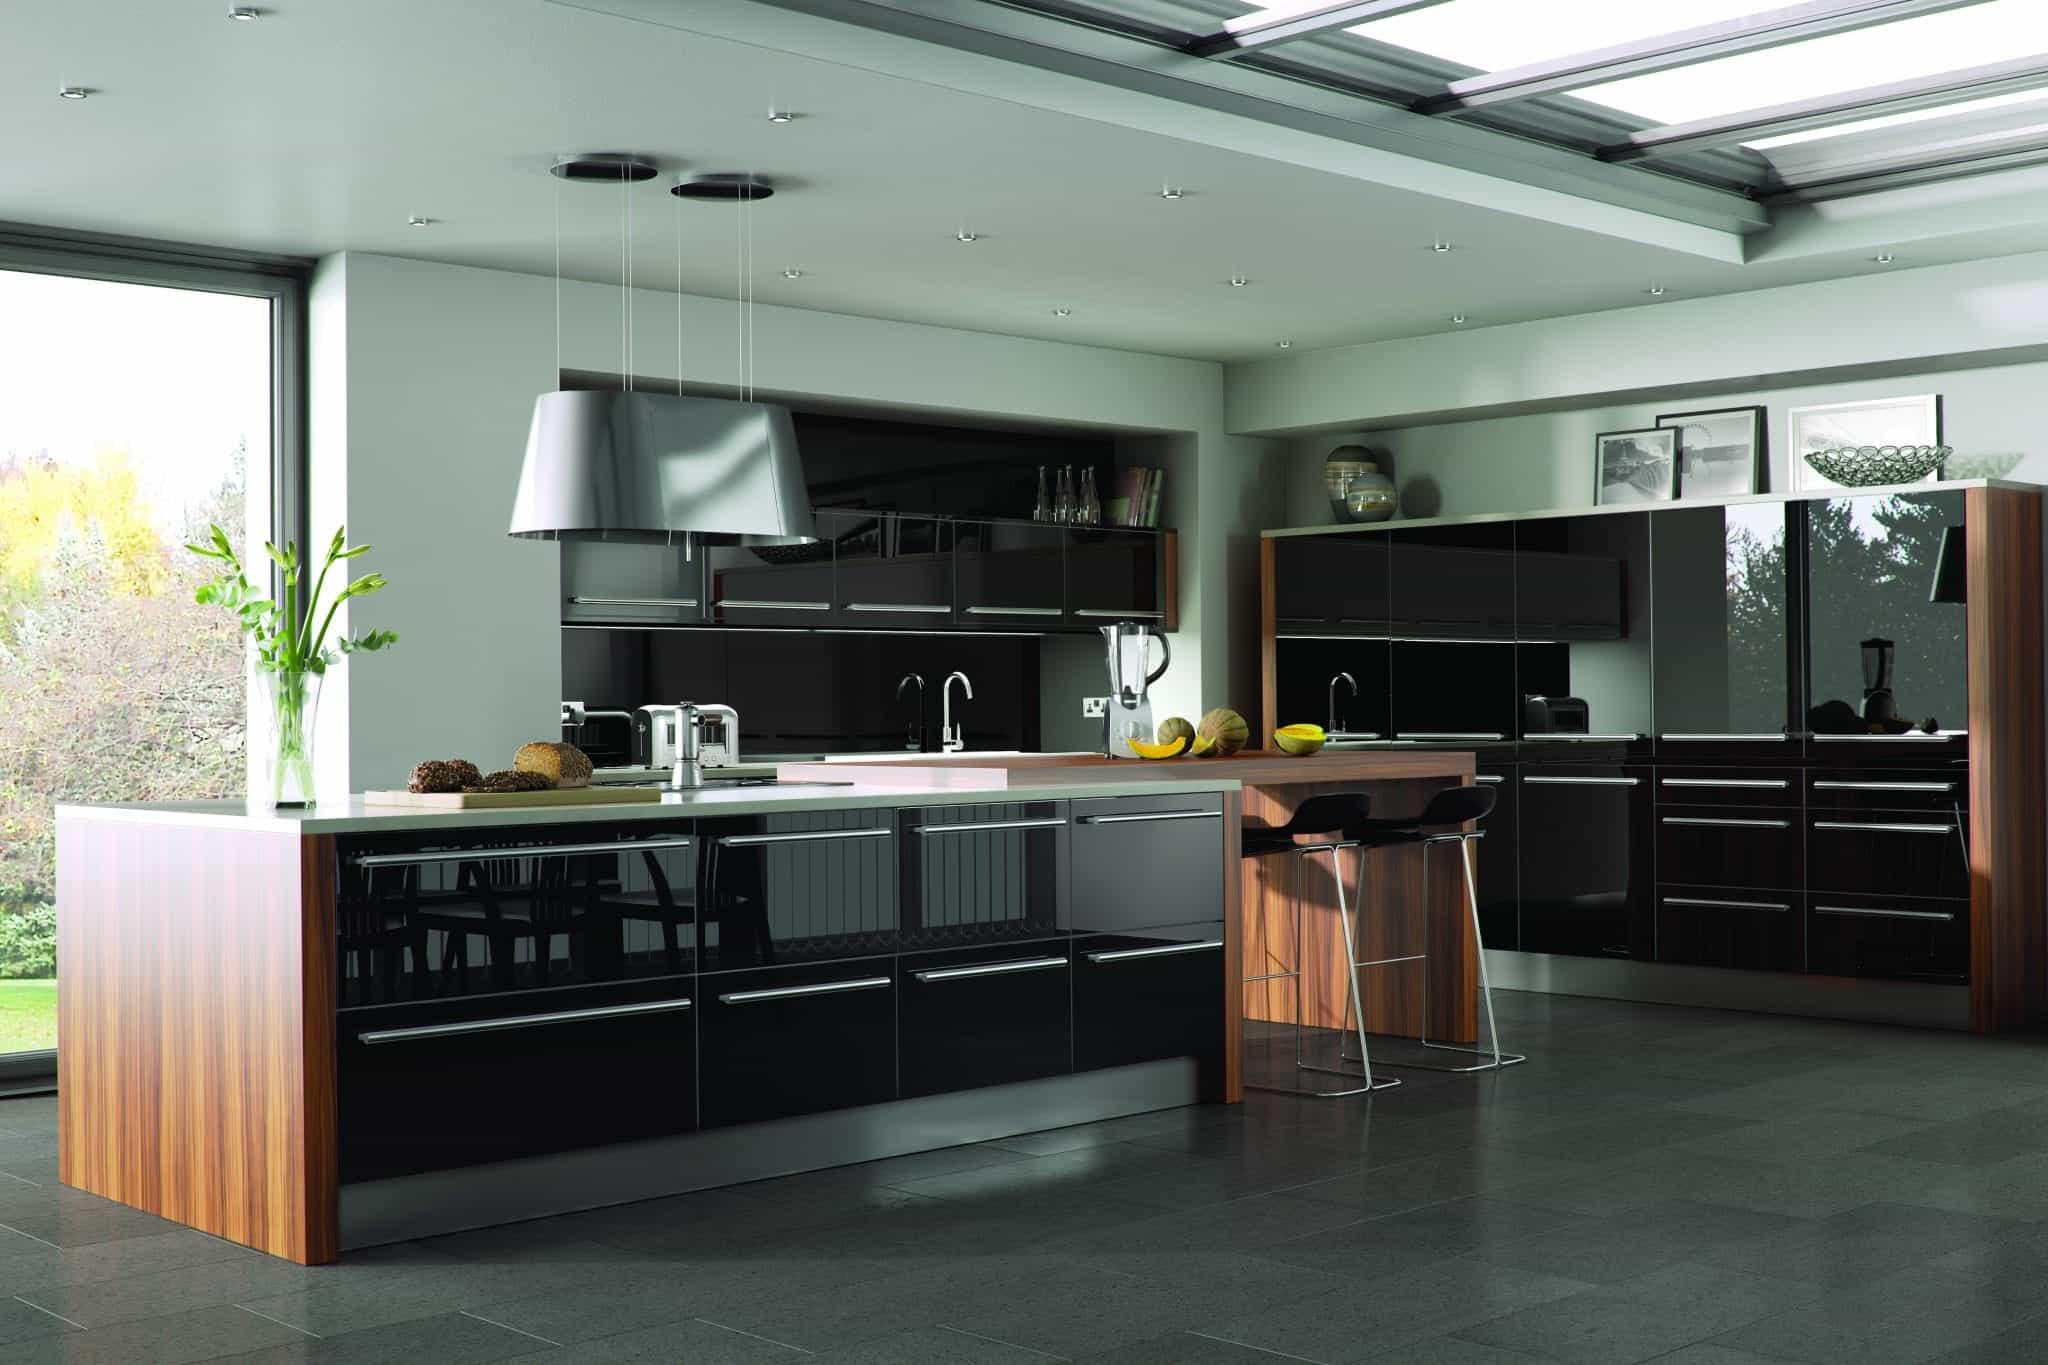 Genoa kitchen in black gloss